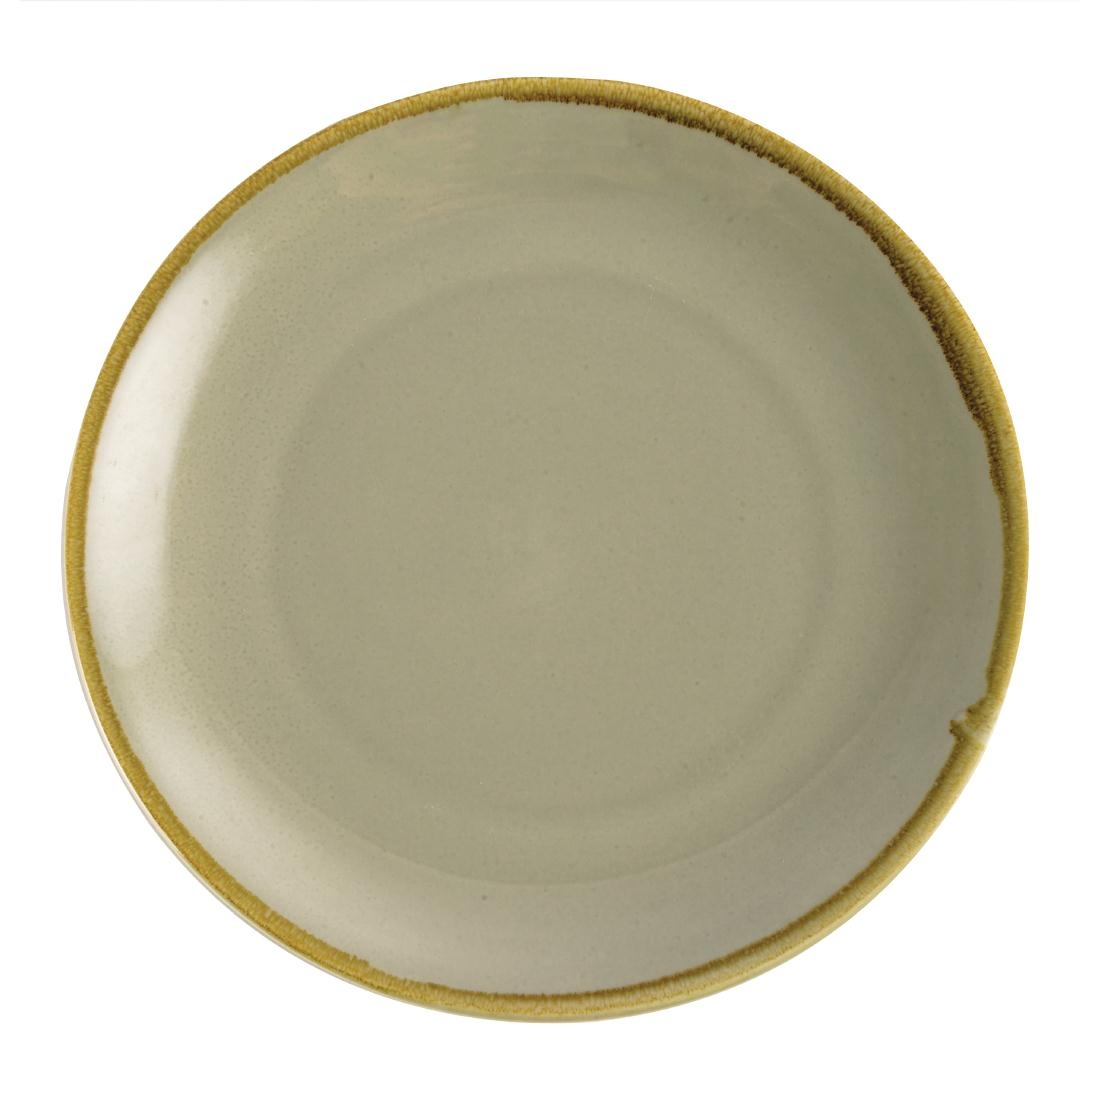 Assiette plate ronde couleur mousse Olympia Kiln 280mm